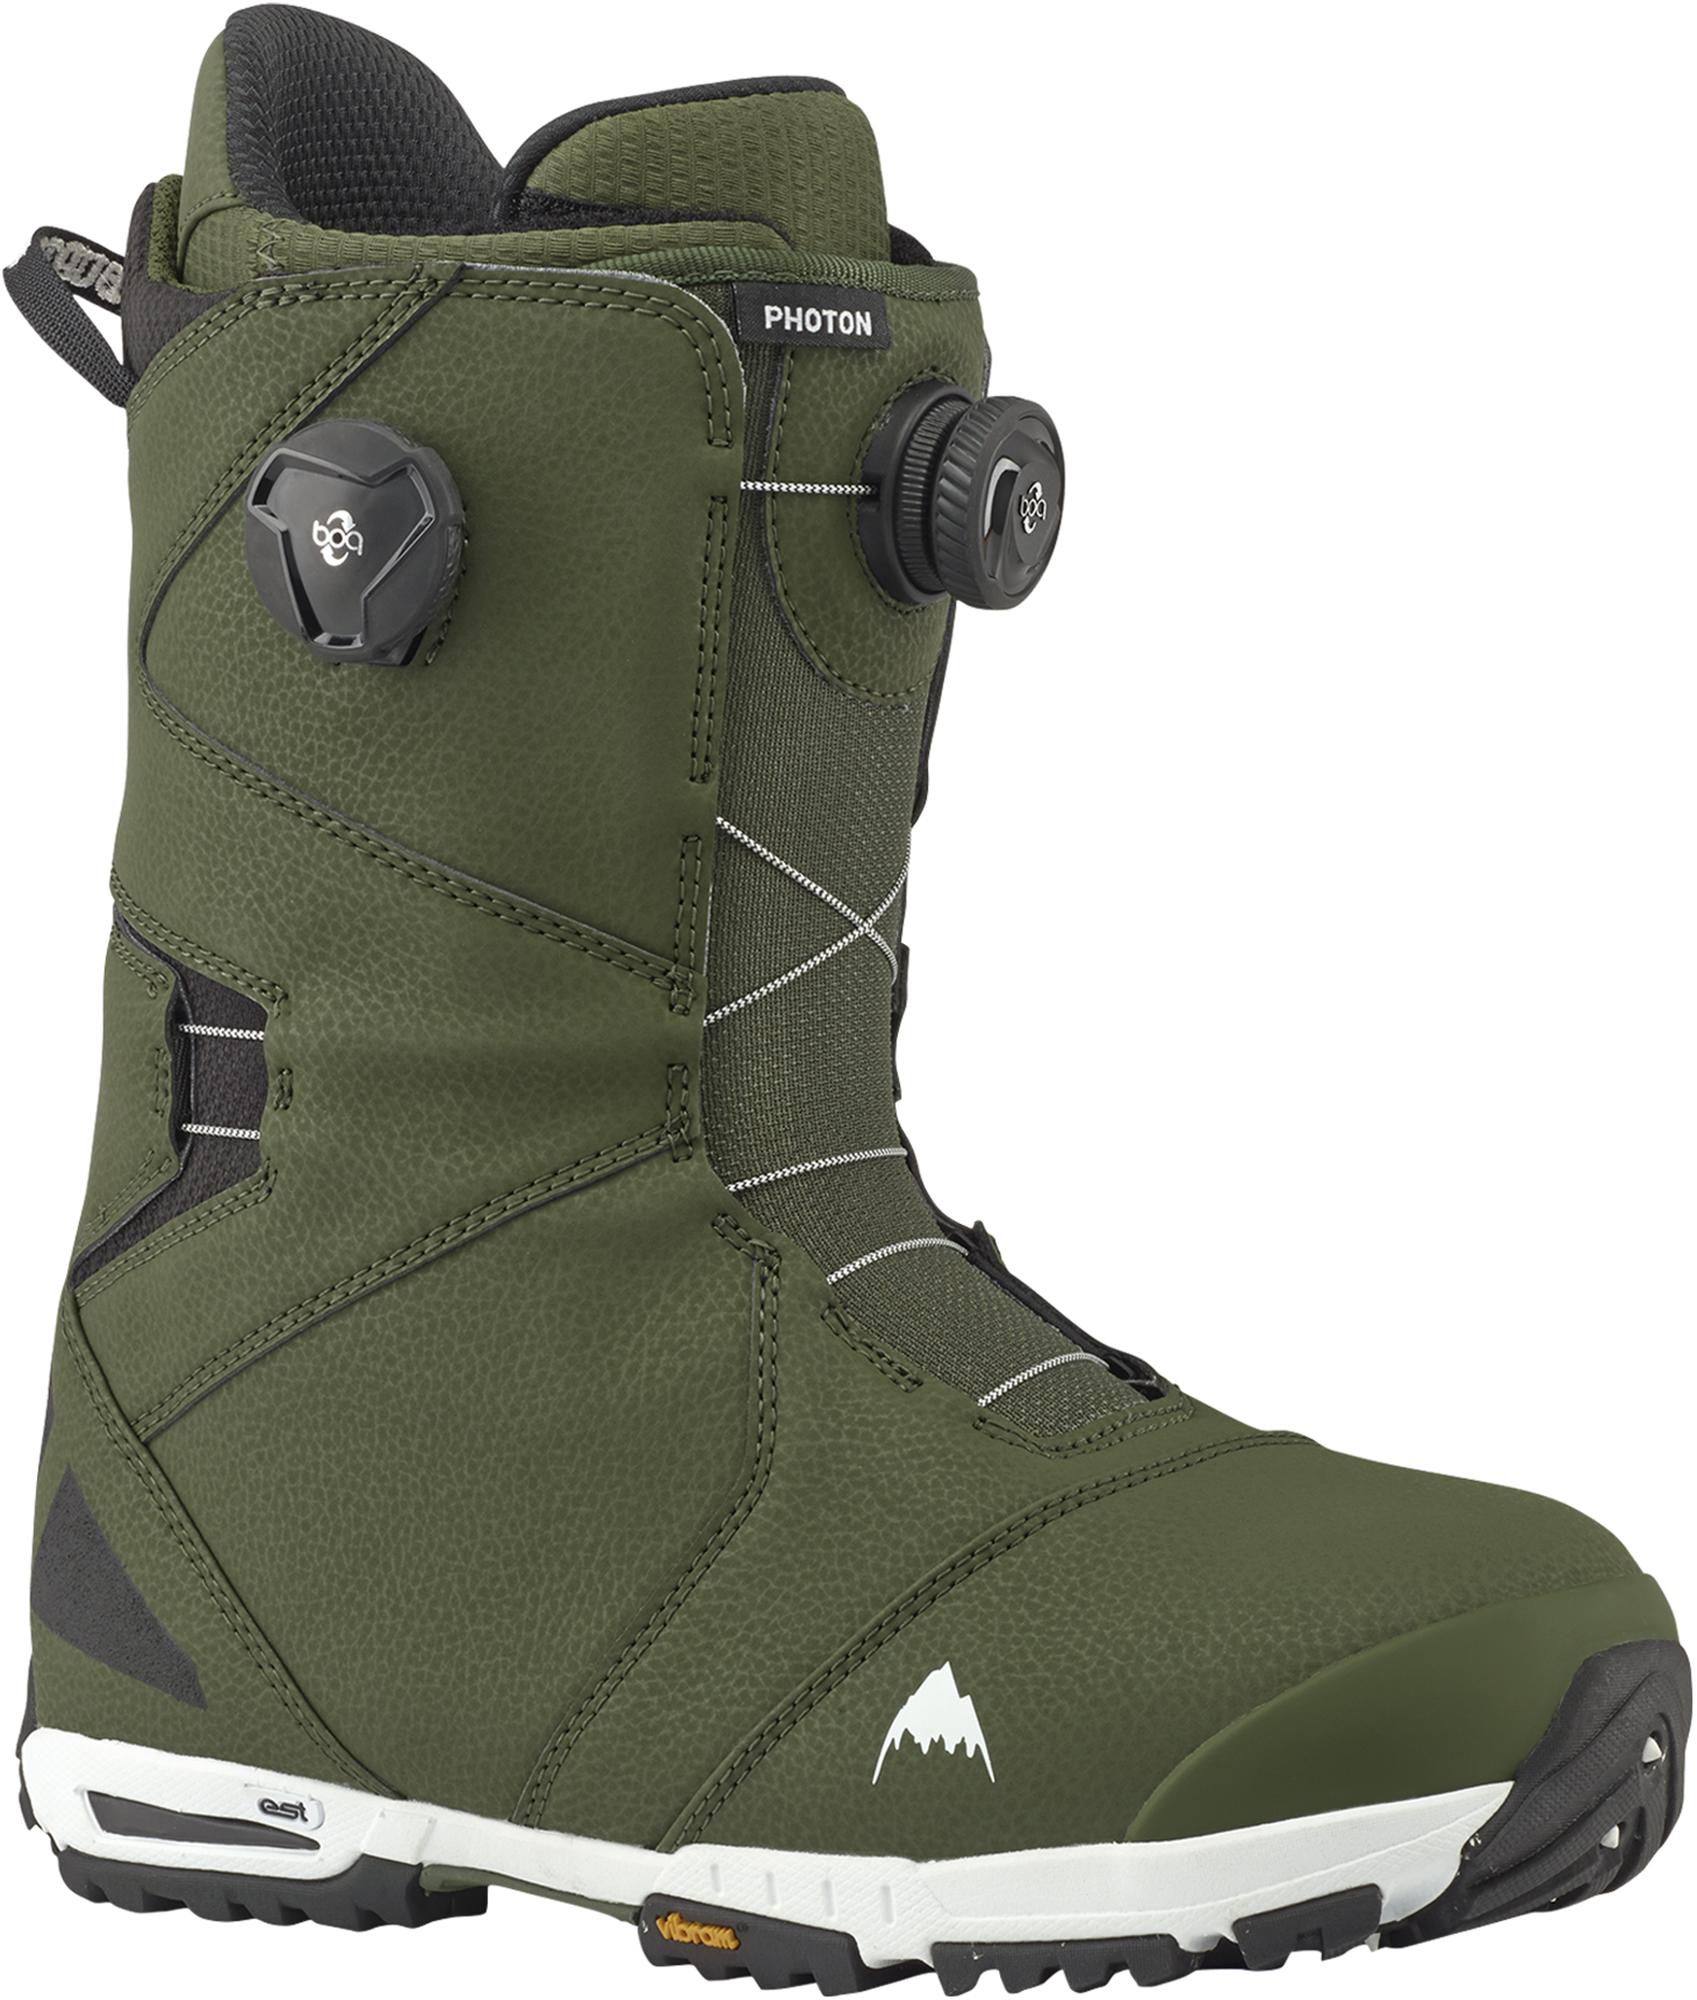 Burton Сноубордические ботинки Burton Photon Boa, размер 44 цены онлайн